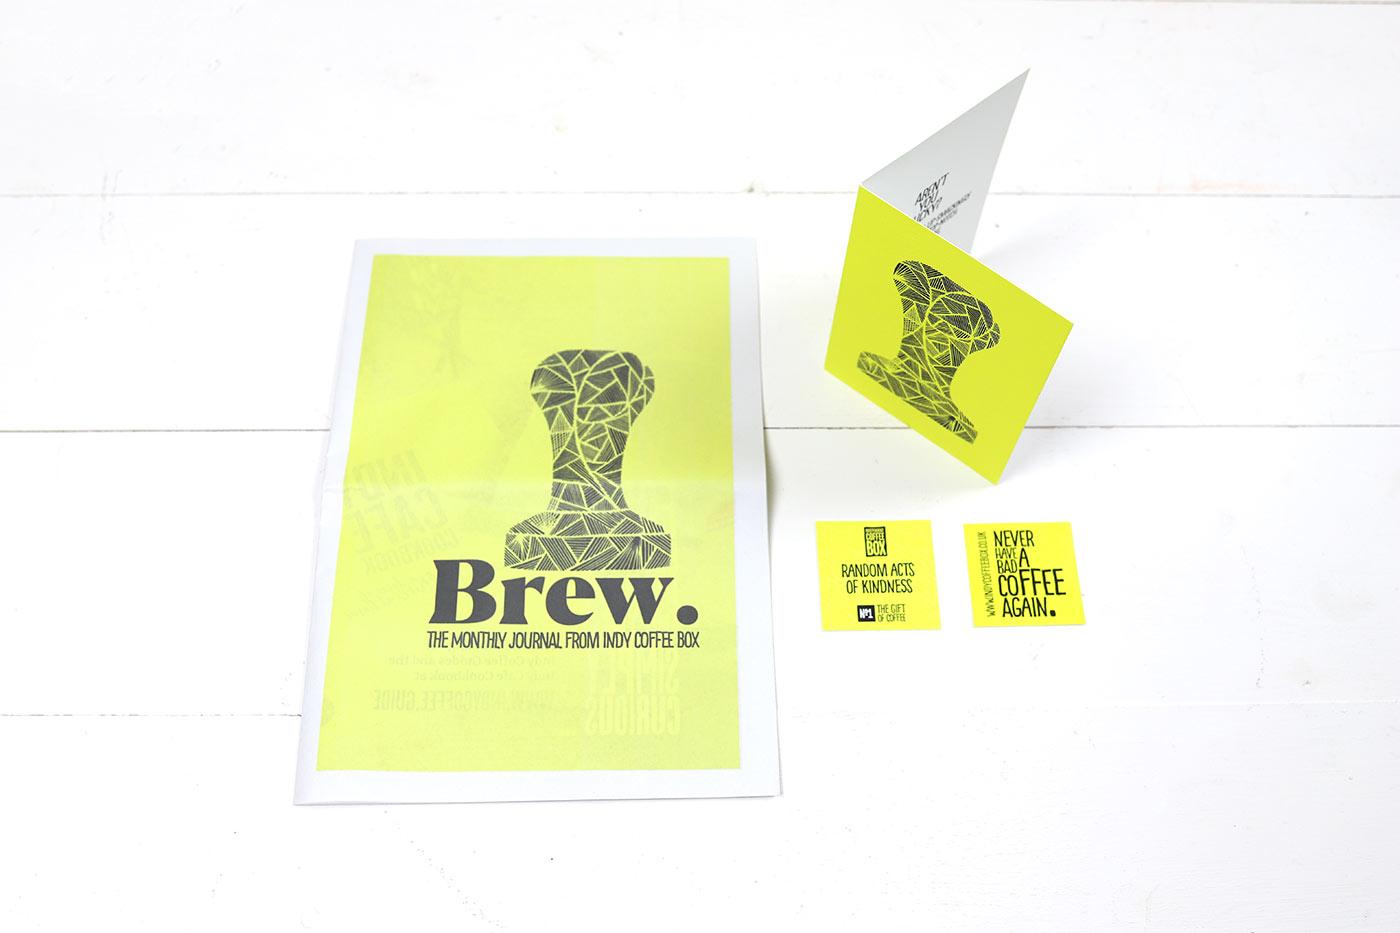 indy coffee box marketing